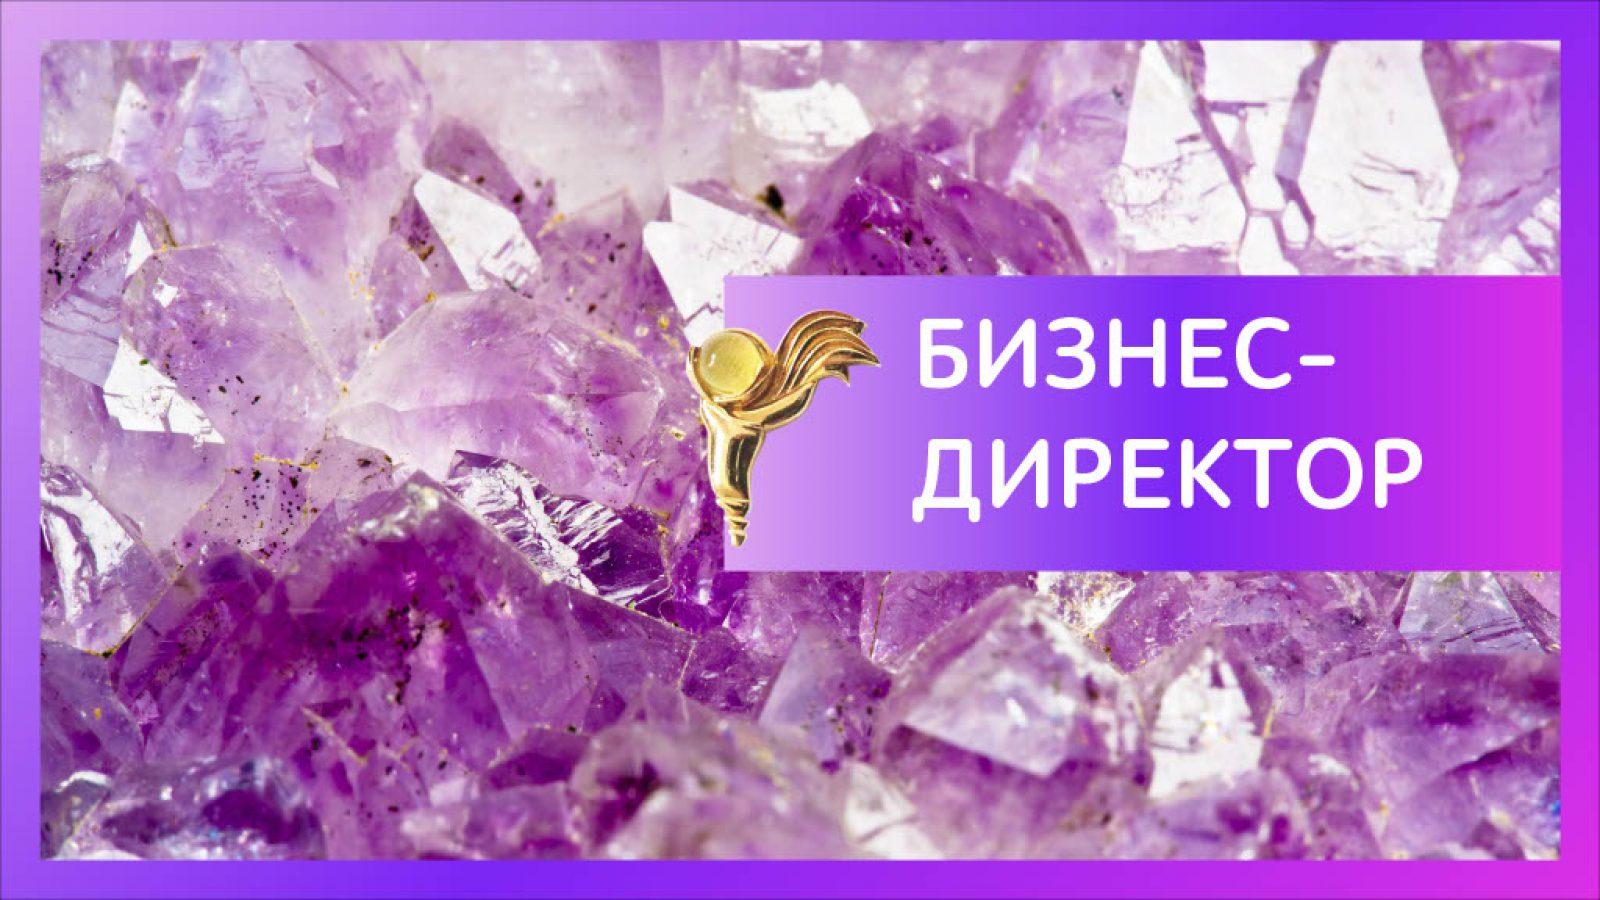 SHTV-2020-_-E-TL-TBTV-TVTGTBTL-TL-TB-TB-_69-TBTVTA1024_54